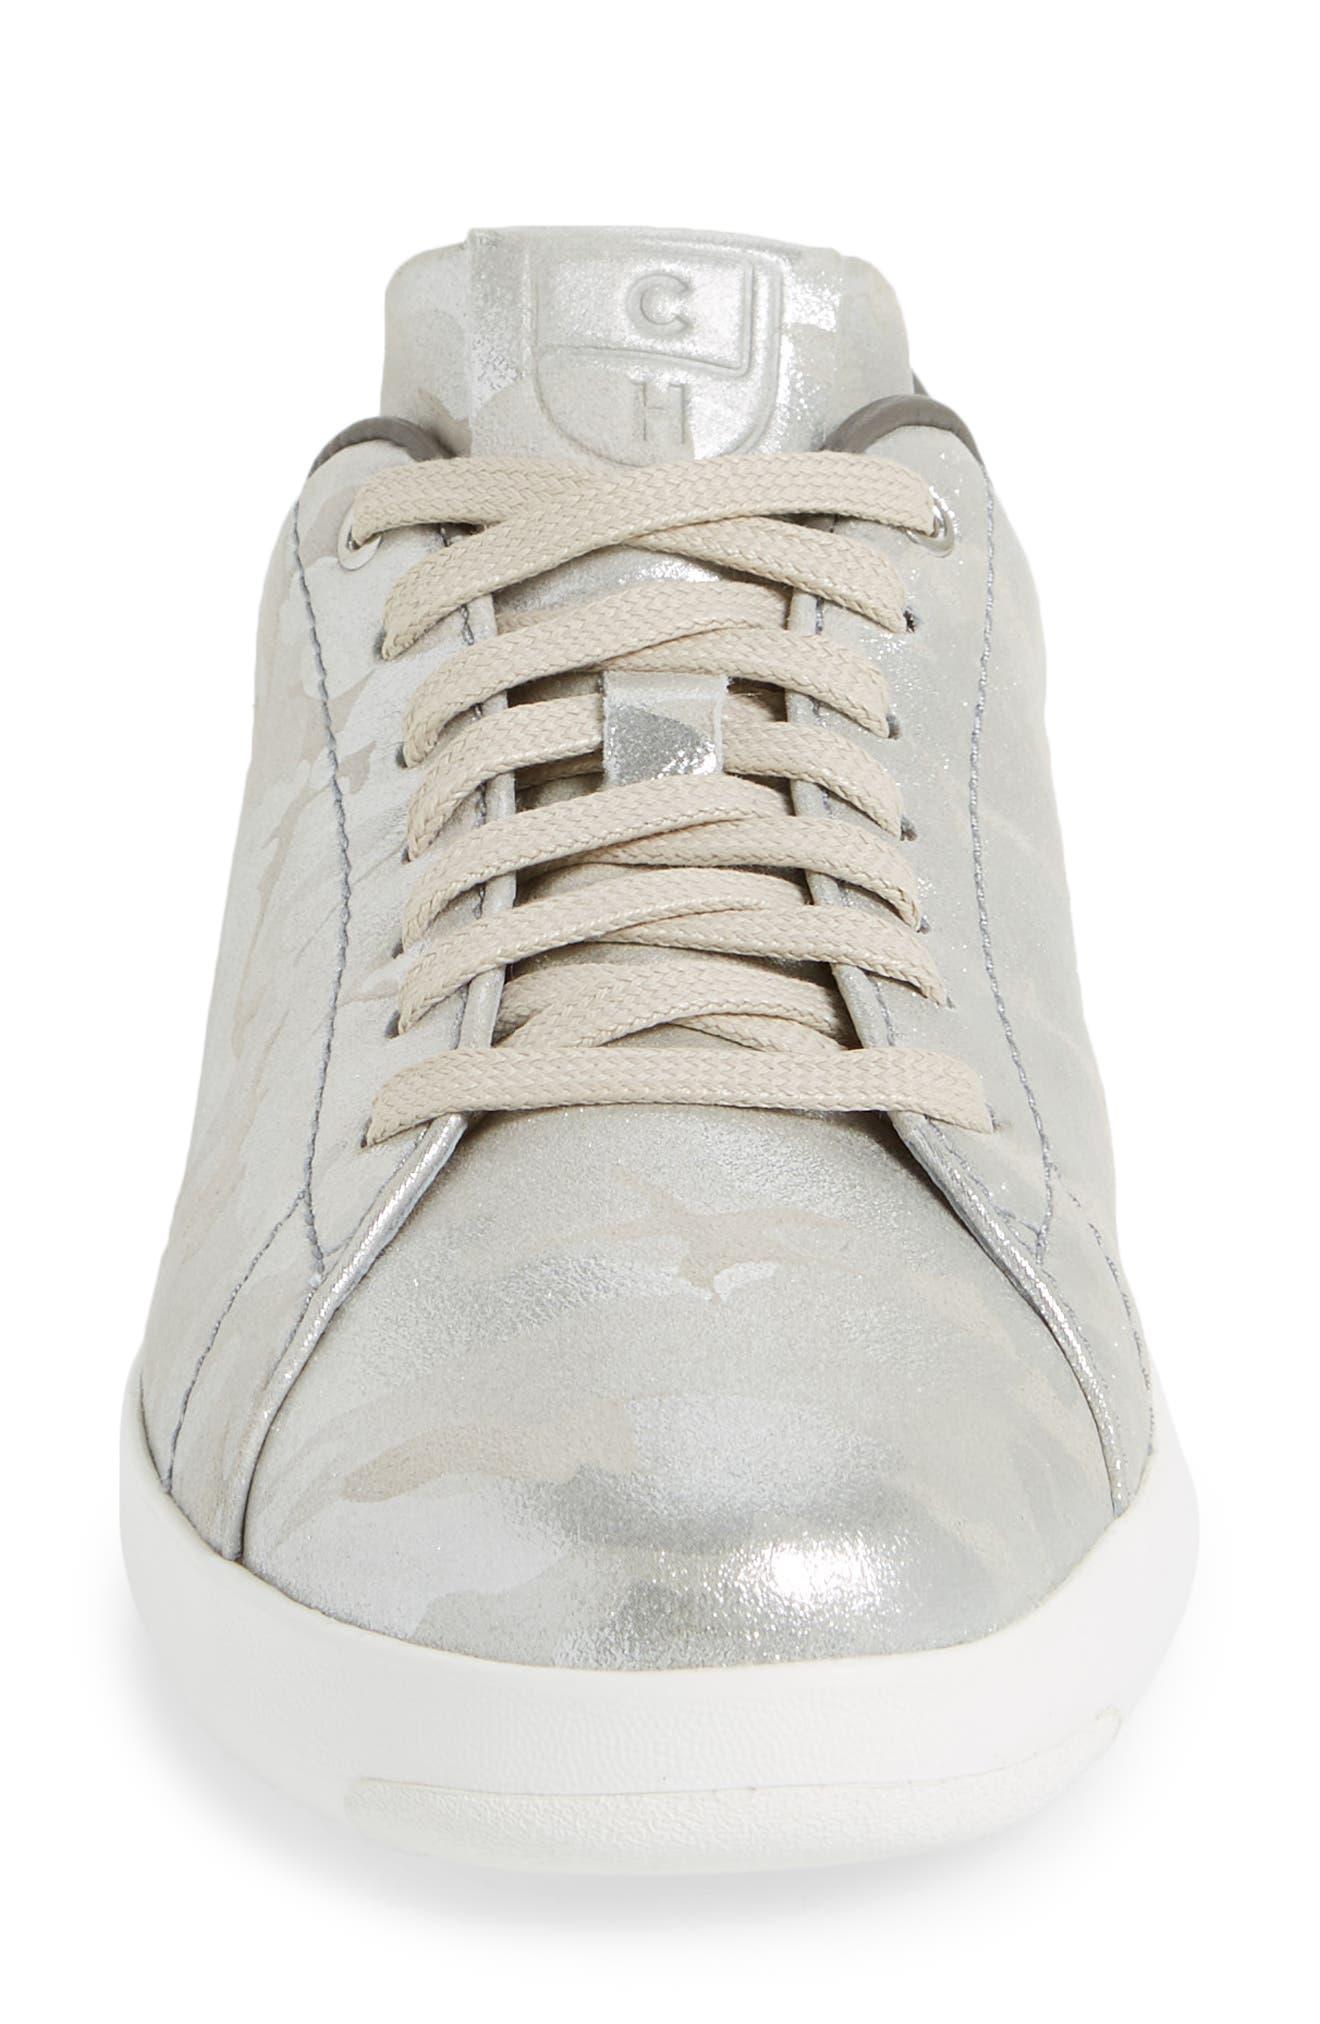 GrandPro Tennis Shoe,                             Alternate thumbnail 4, color,                             Dove Metallic Camo Leather